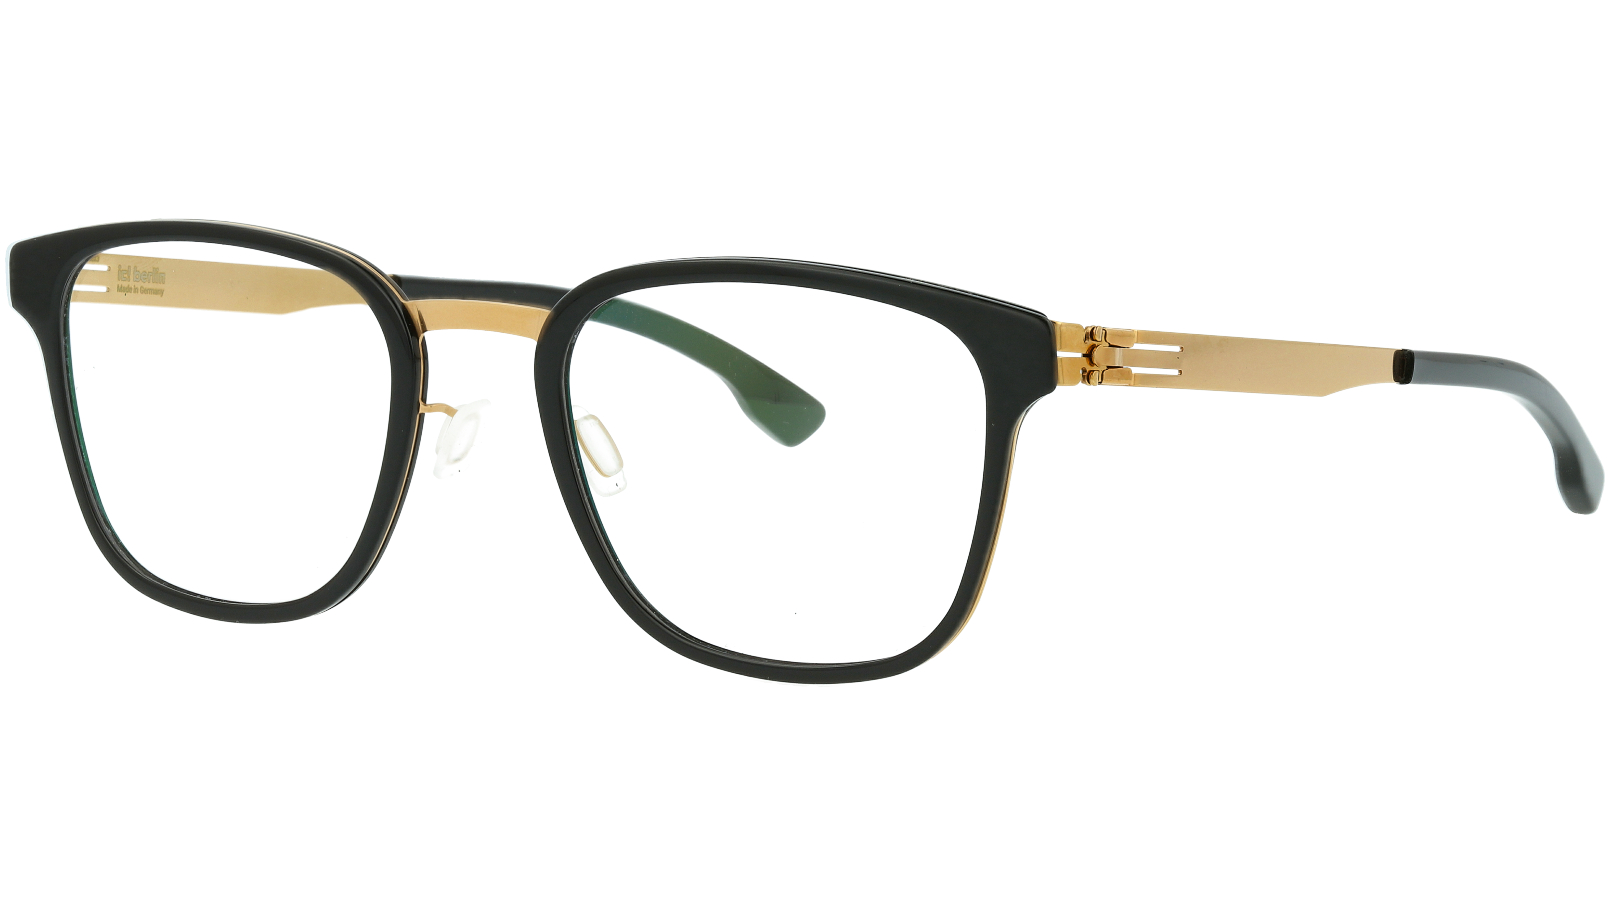 ic! Berlin Mr.Bice Rose 52 Mittwoch Glasses